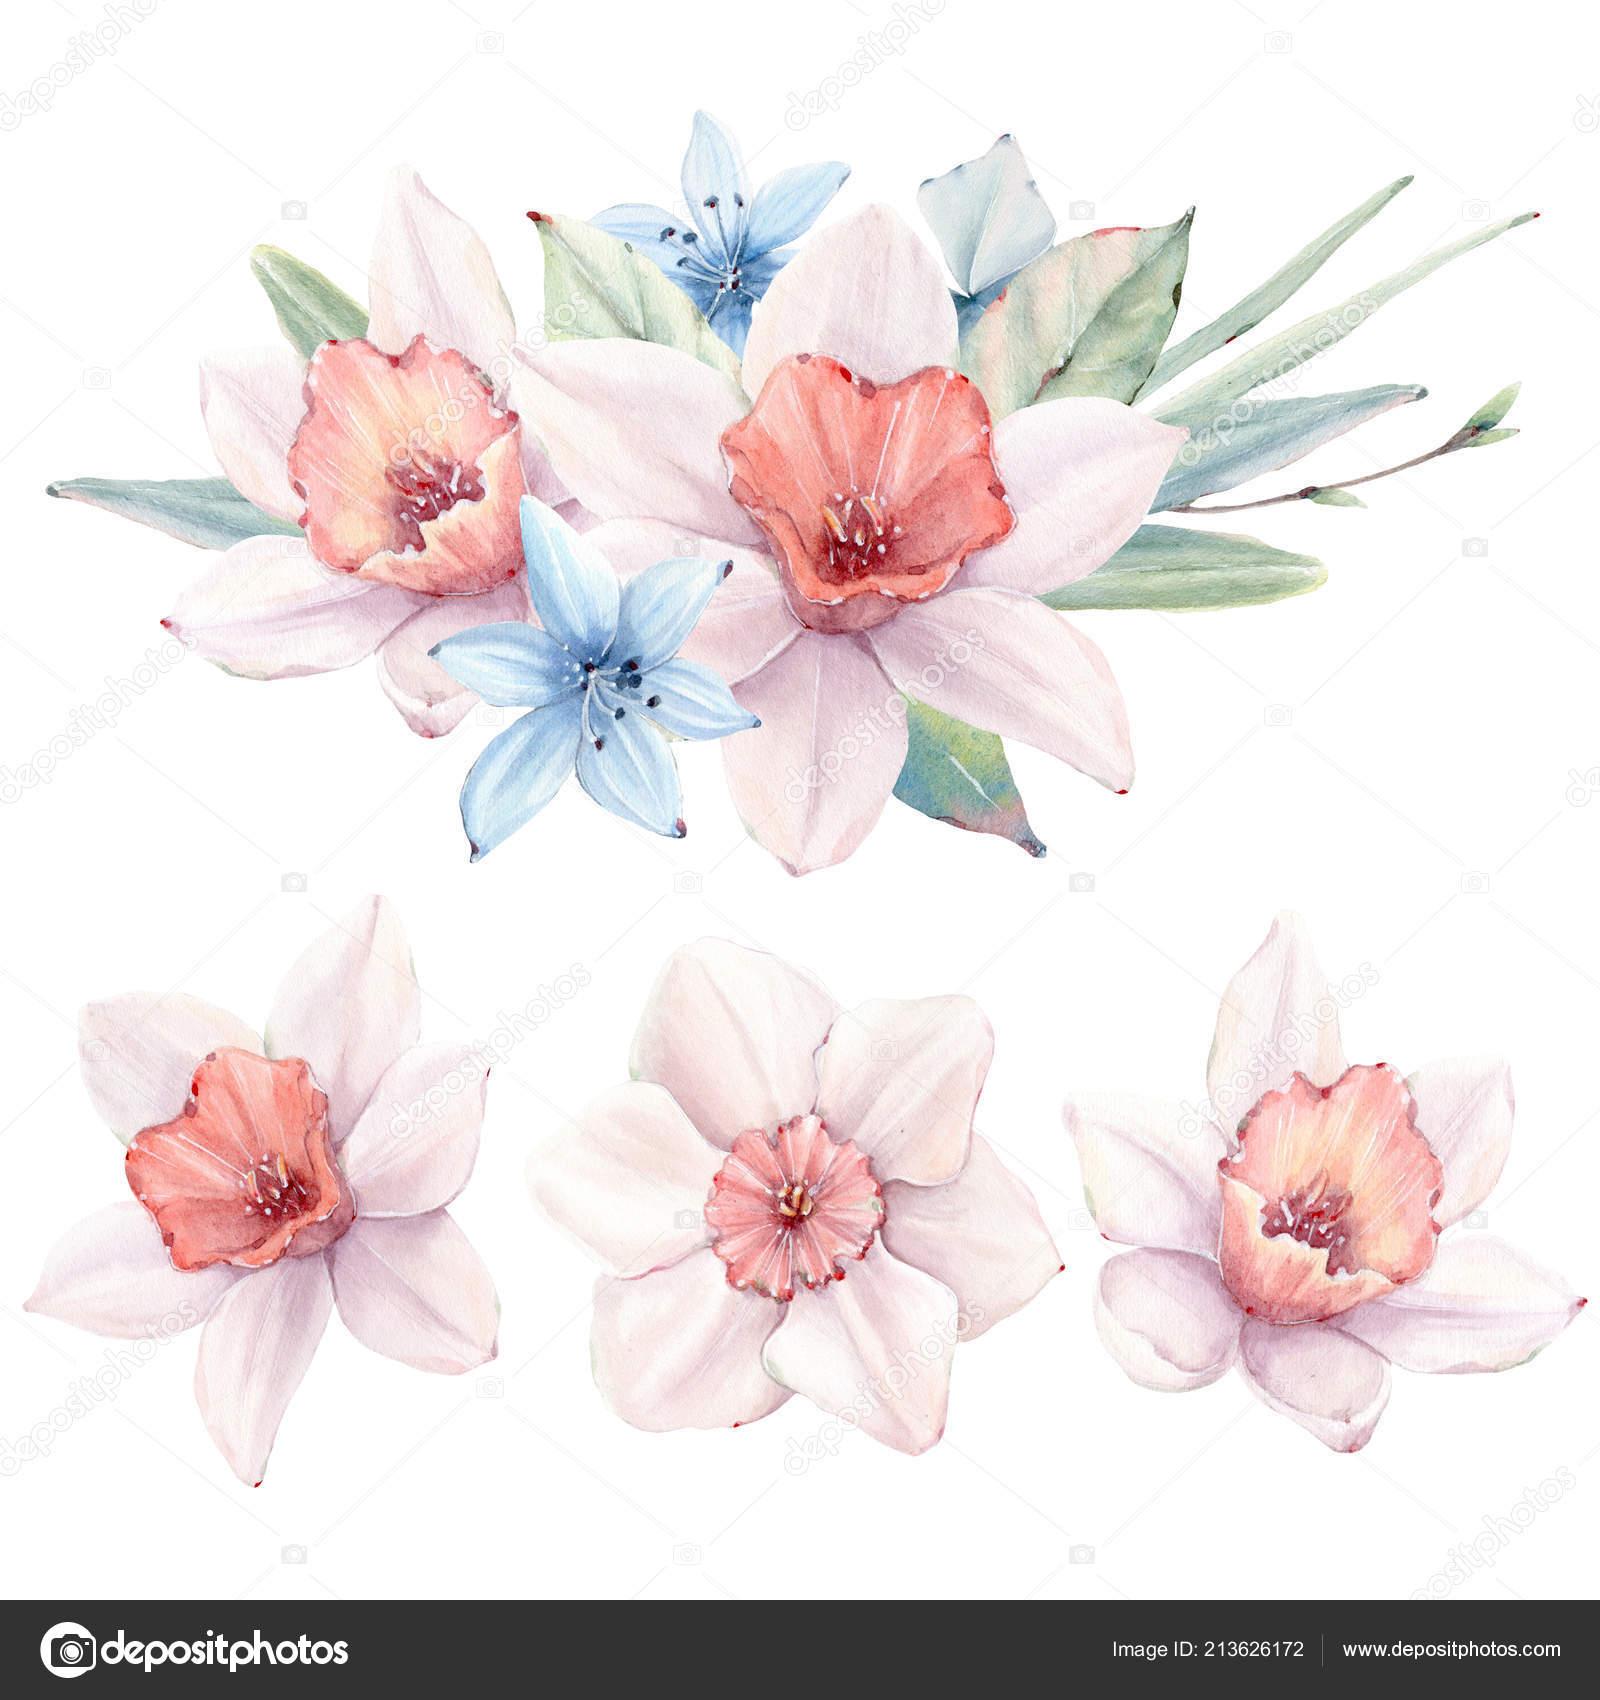 Aquarell Fruhlingsblumen Vintage Stil Festgelegt Ist Ideal Fur